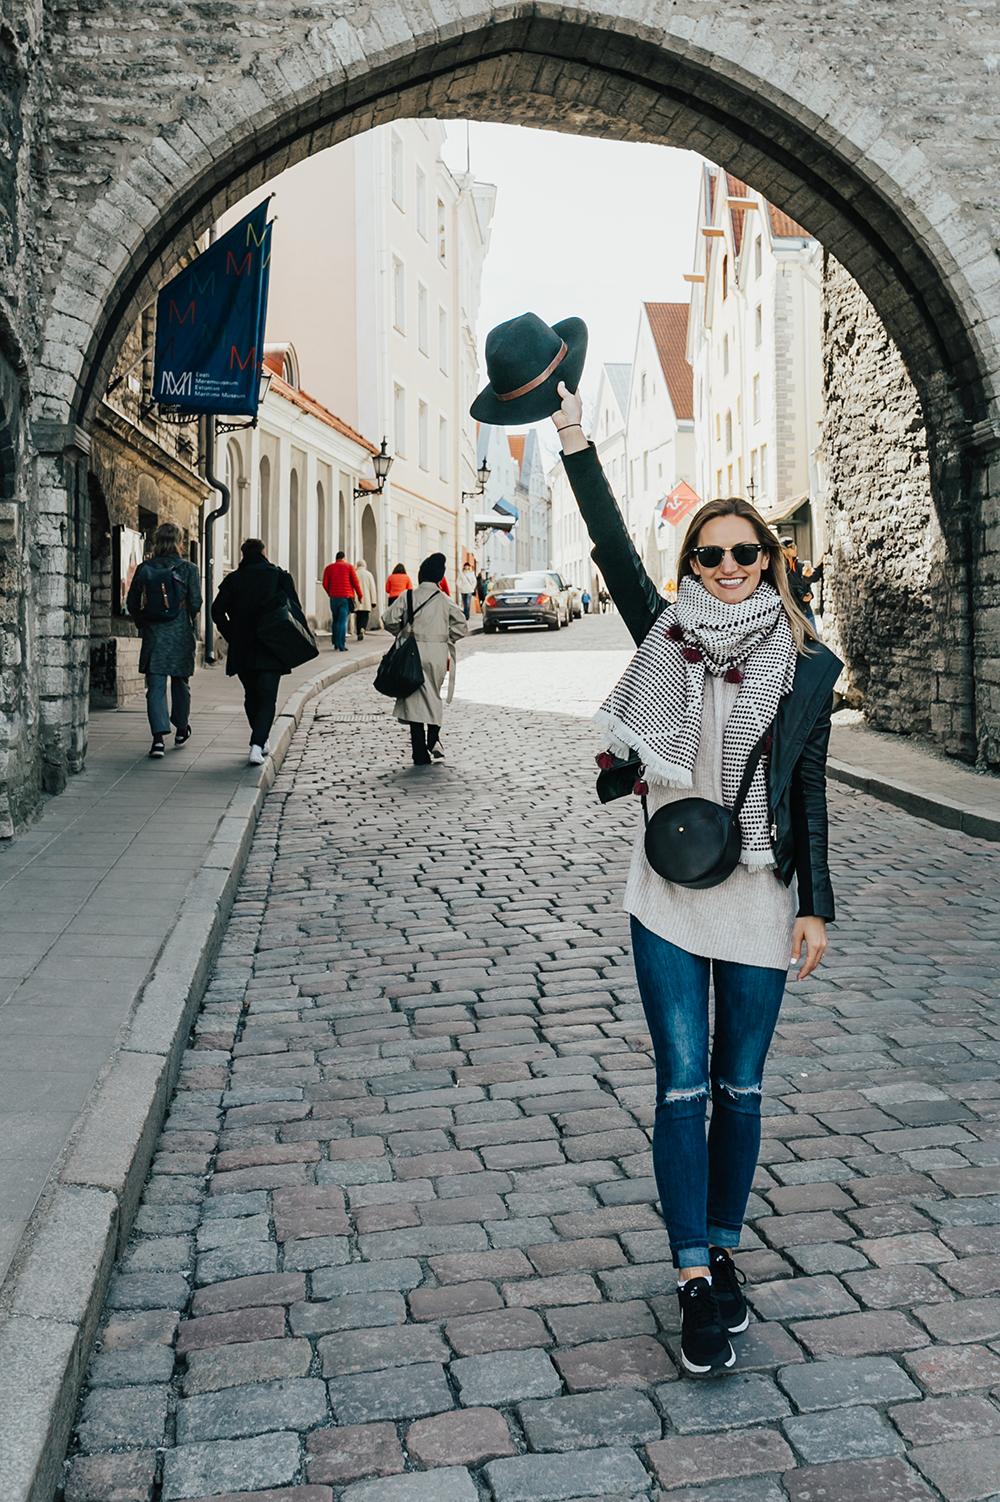 livvyland-blog-olivia-watson-fashion-travel-blogger-princess-cruises-scandinavia-northern-europe-what-to-do-wear-tallinn-estonia-2